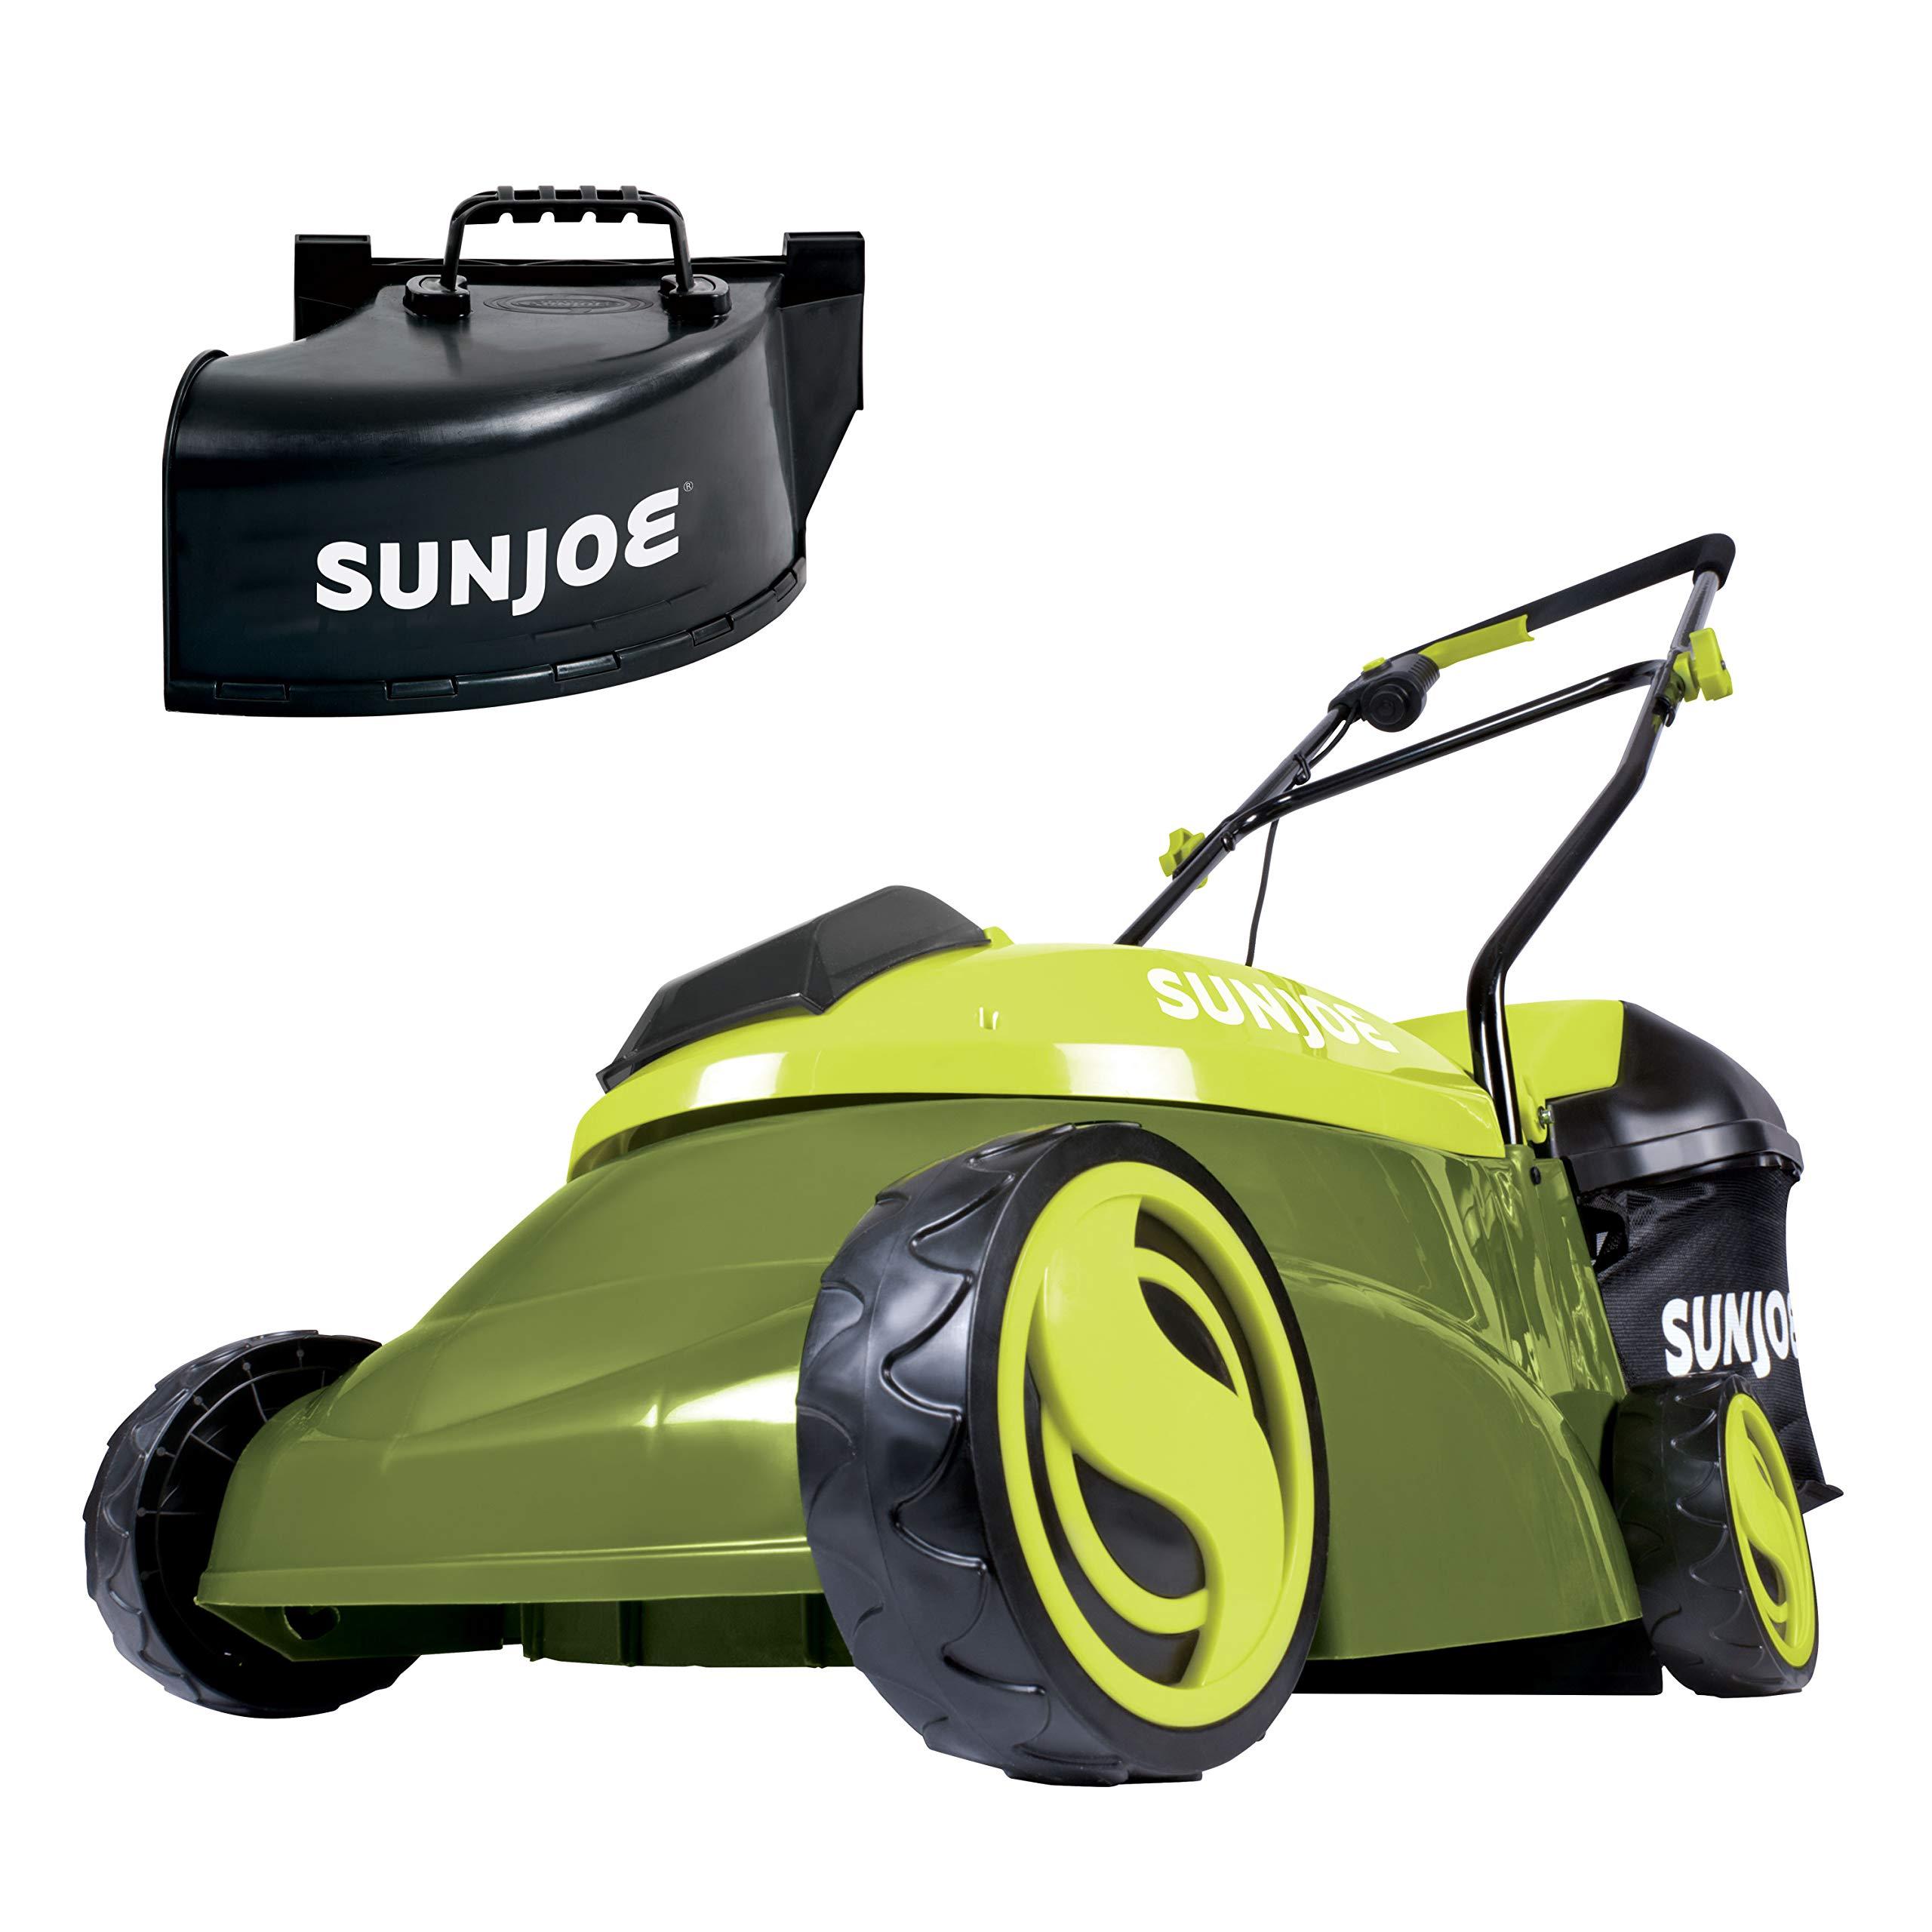 Sun Joe MJ401C-PRO 14-Inch 28-Volt Cordless Push Lawn Mower, w/Rear Discharge Chute by Sun Joe